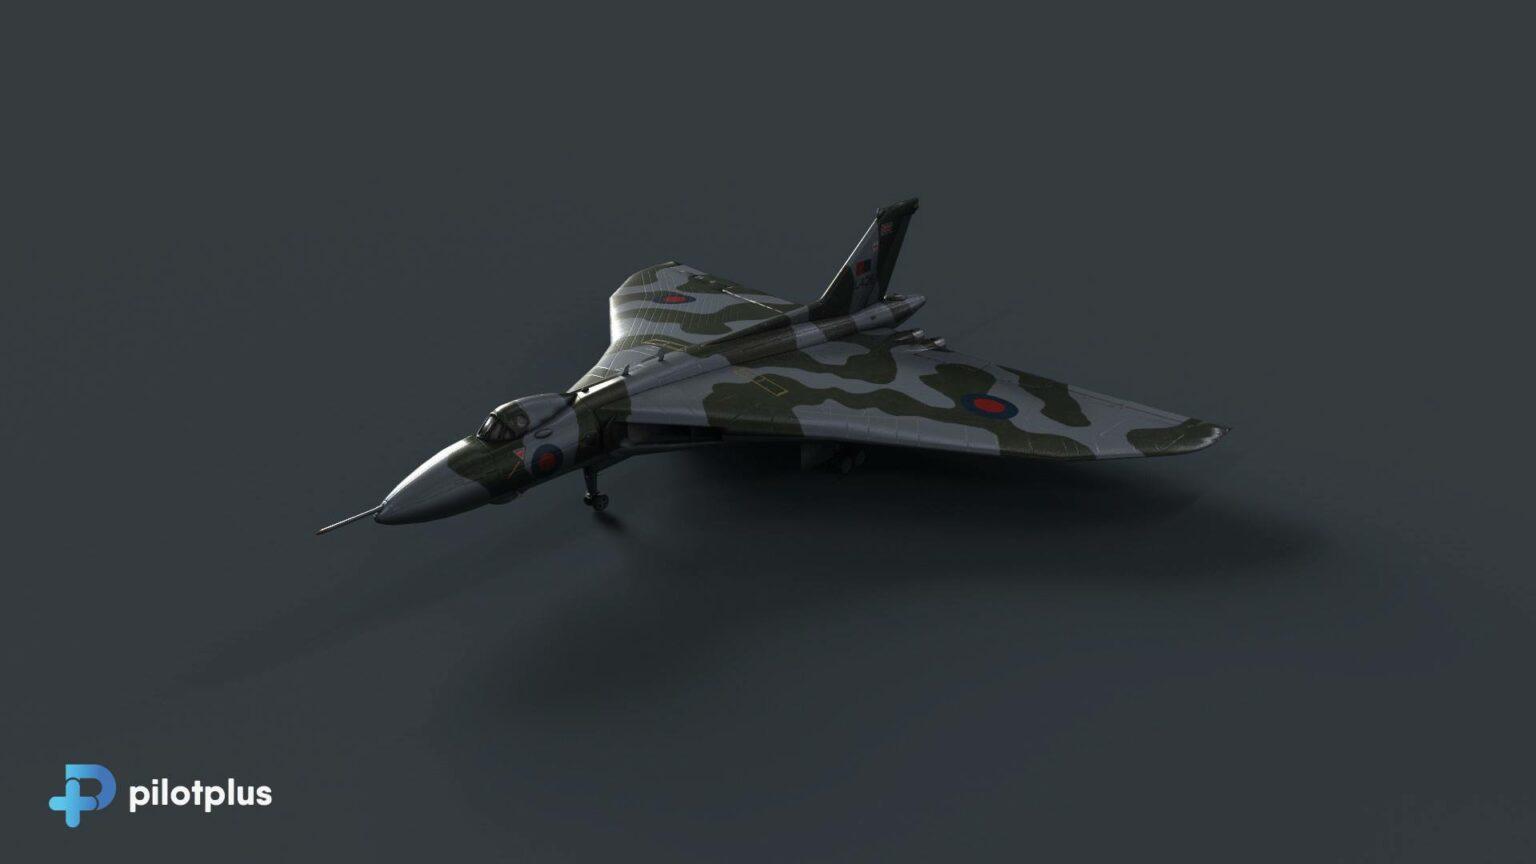 pilotplus_Southend (8)